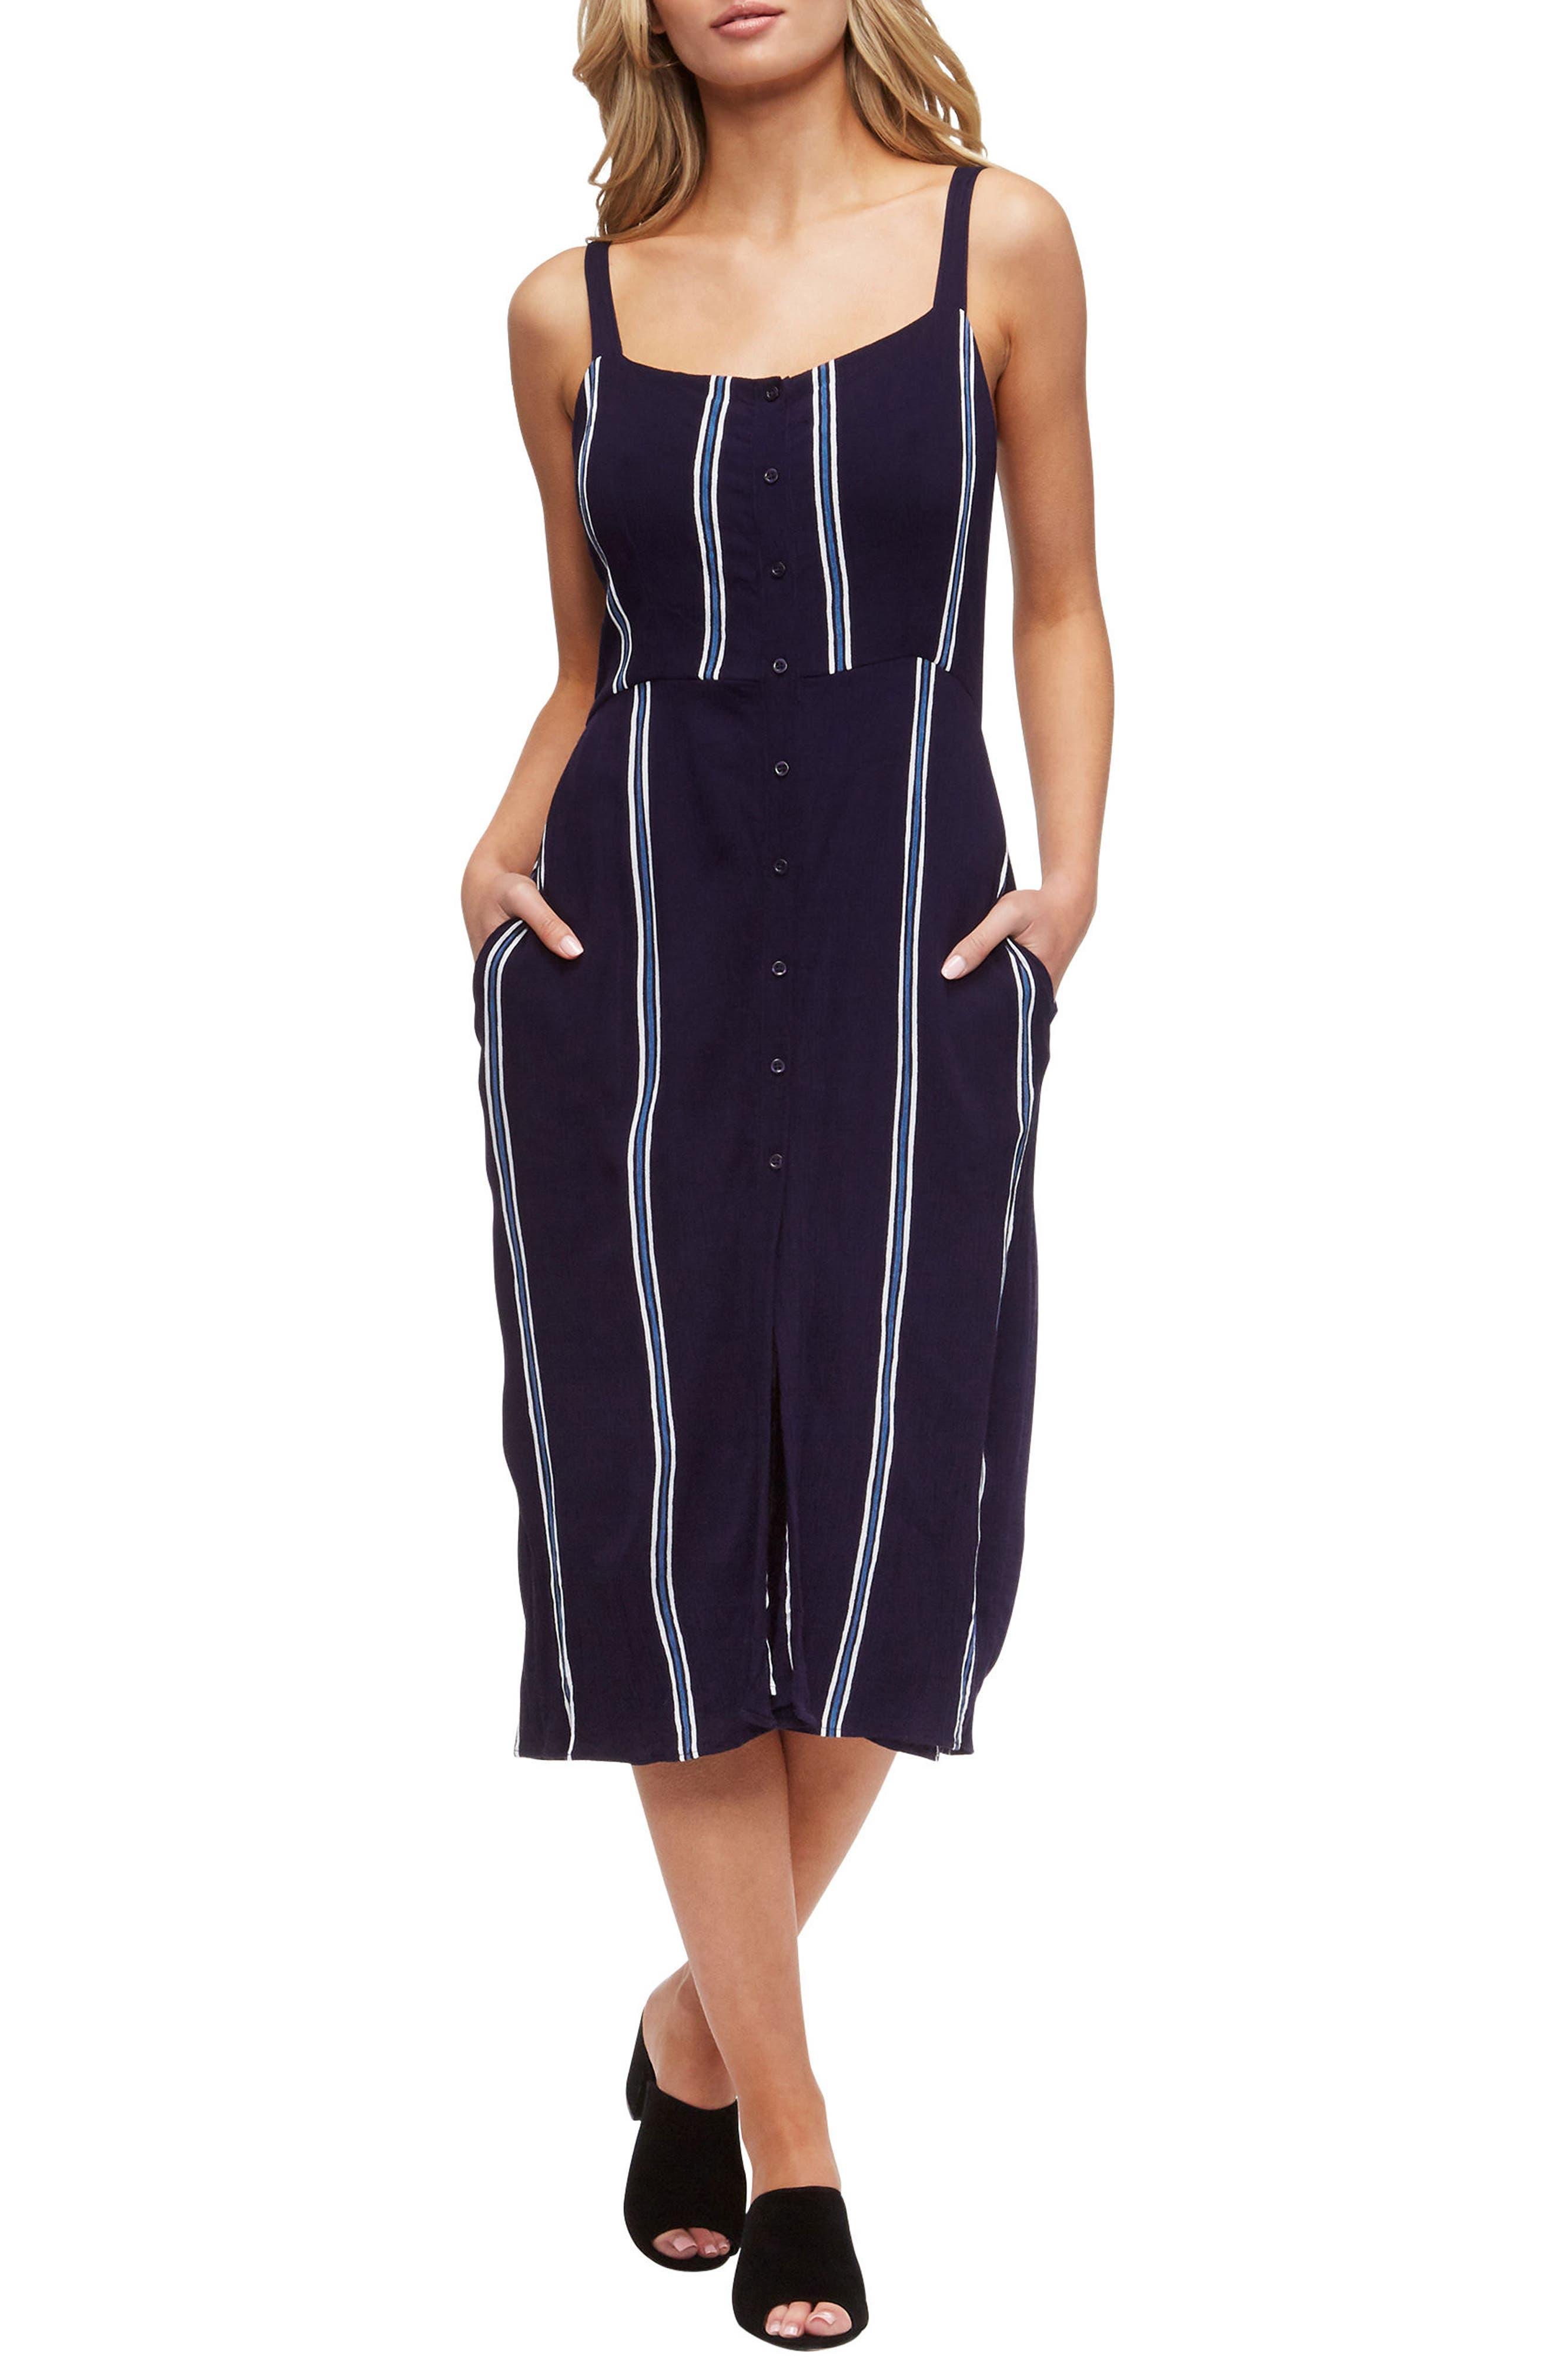 Geni Cover-Up Dress,                             Main thumbnail 1, color,                             Evening Blue/White Stripe